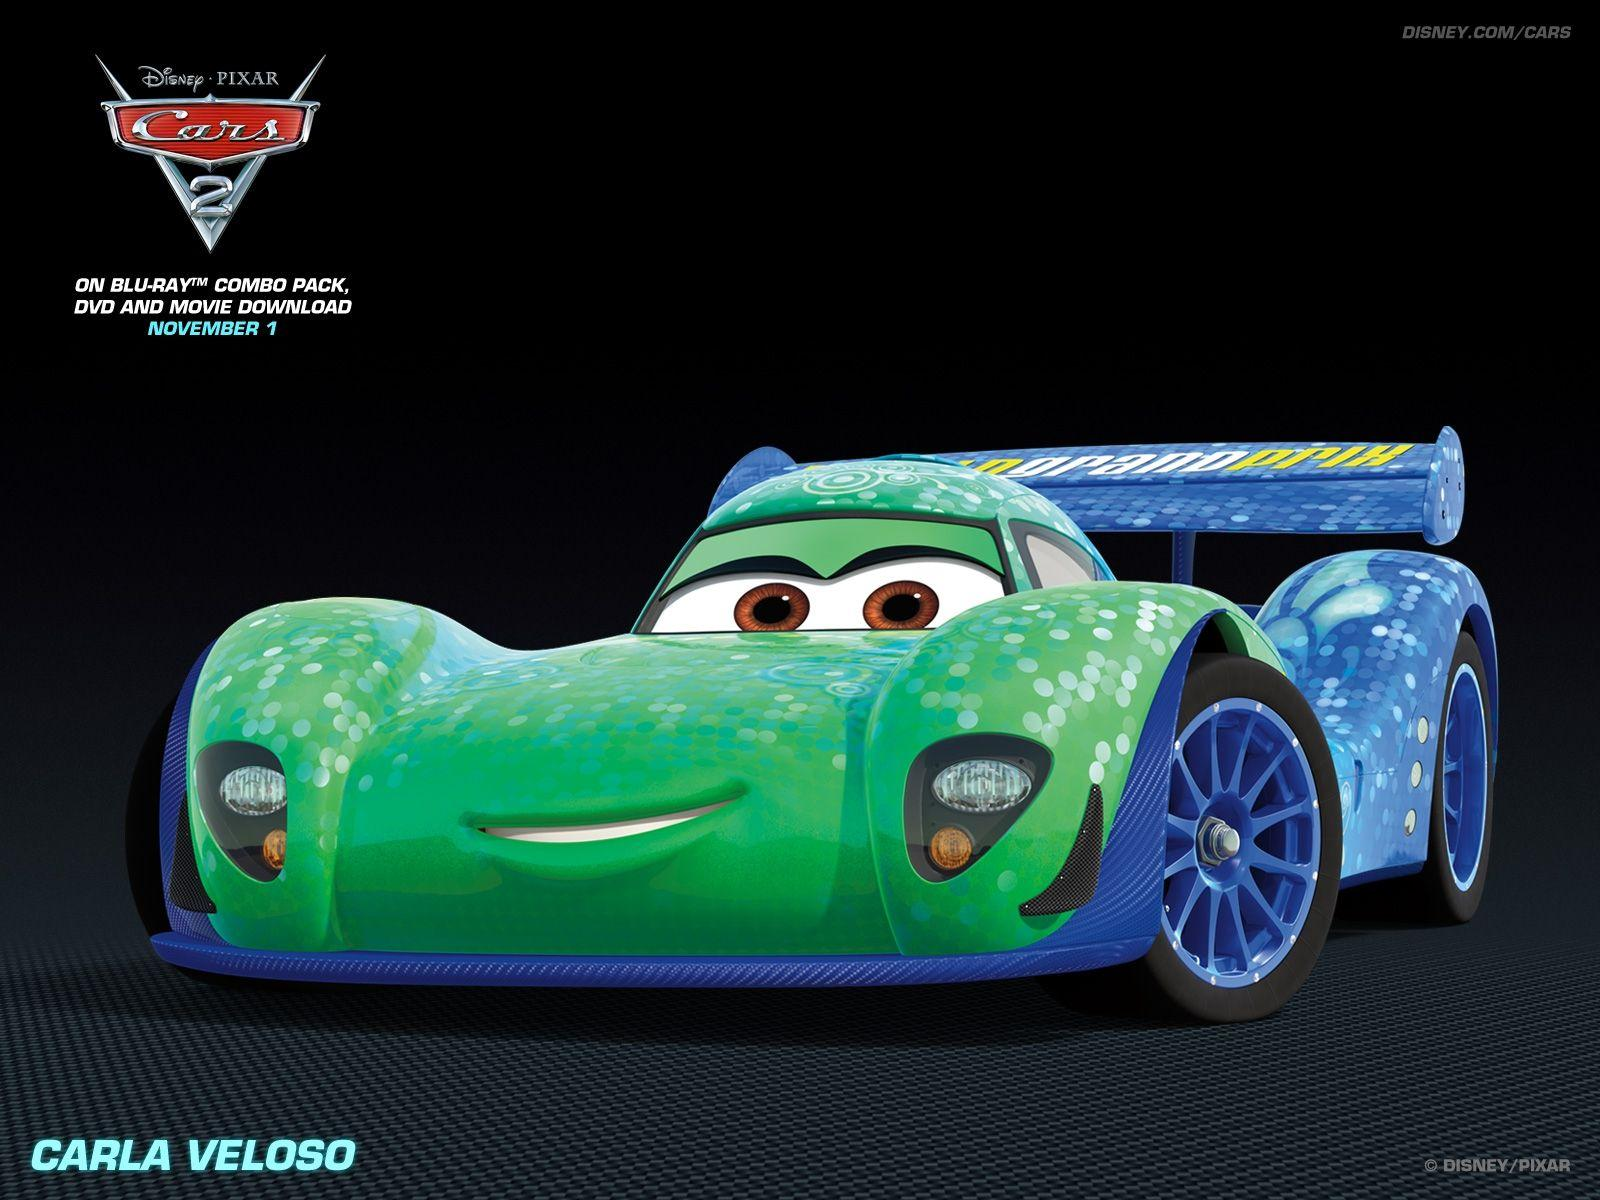 Disney Pixar Cars Wallpapers Hd Wallpaper Cave